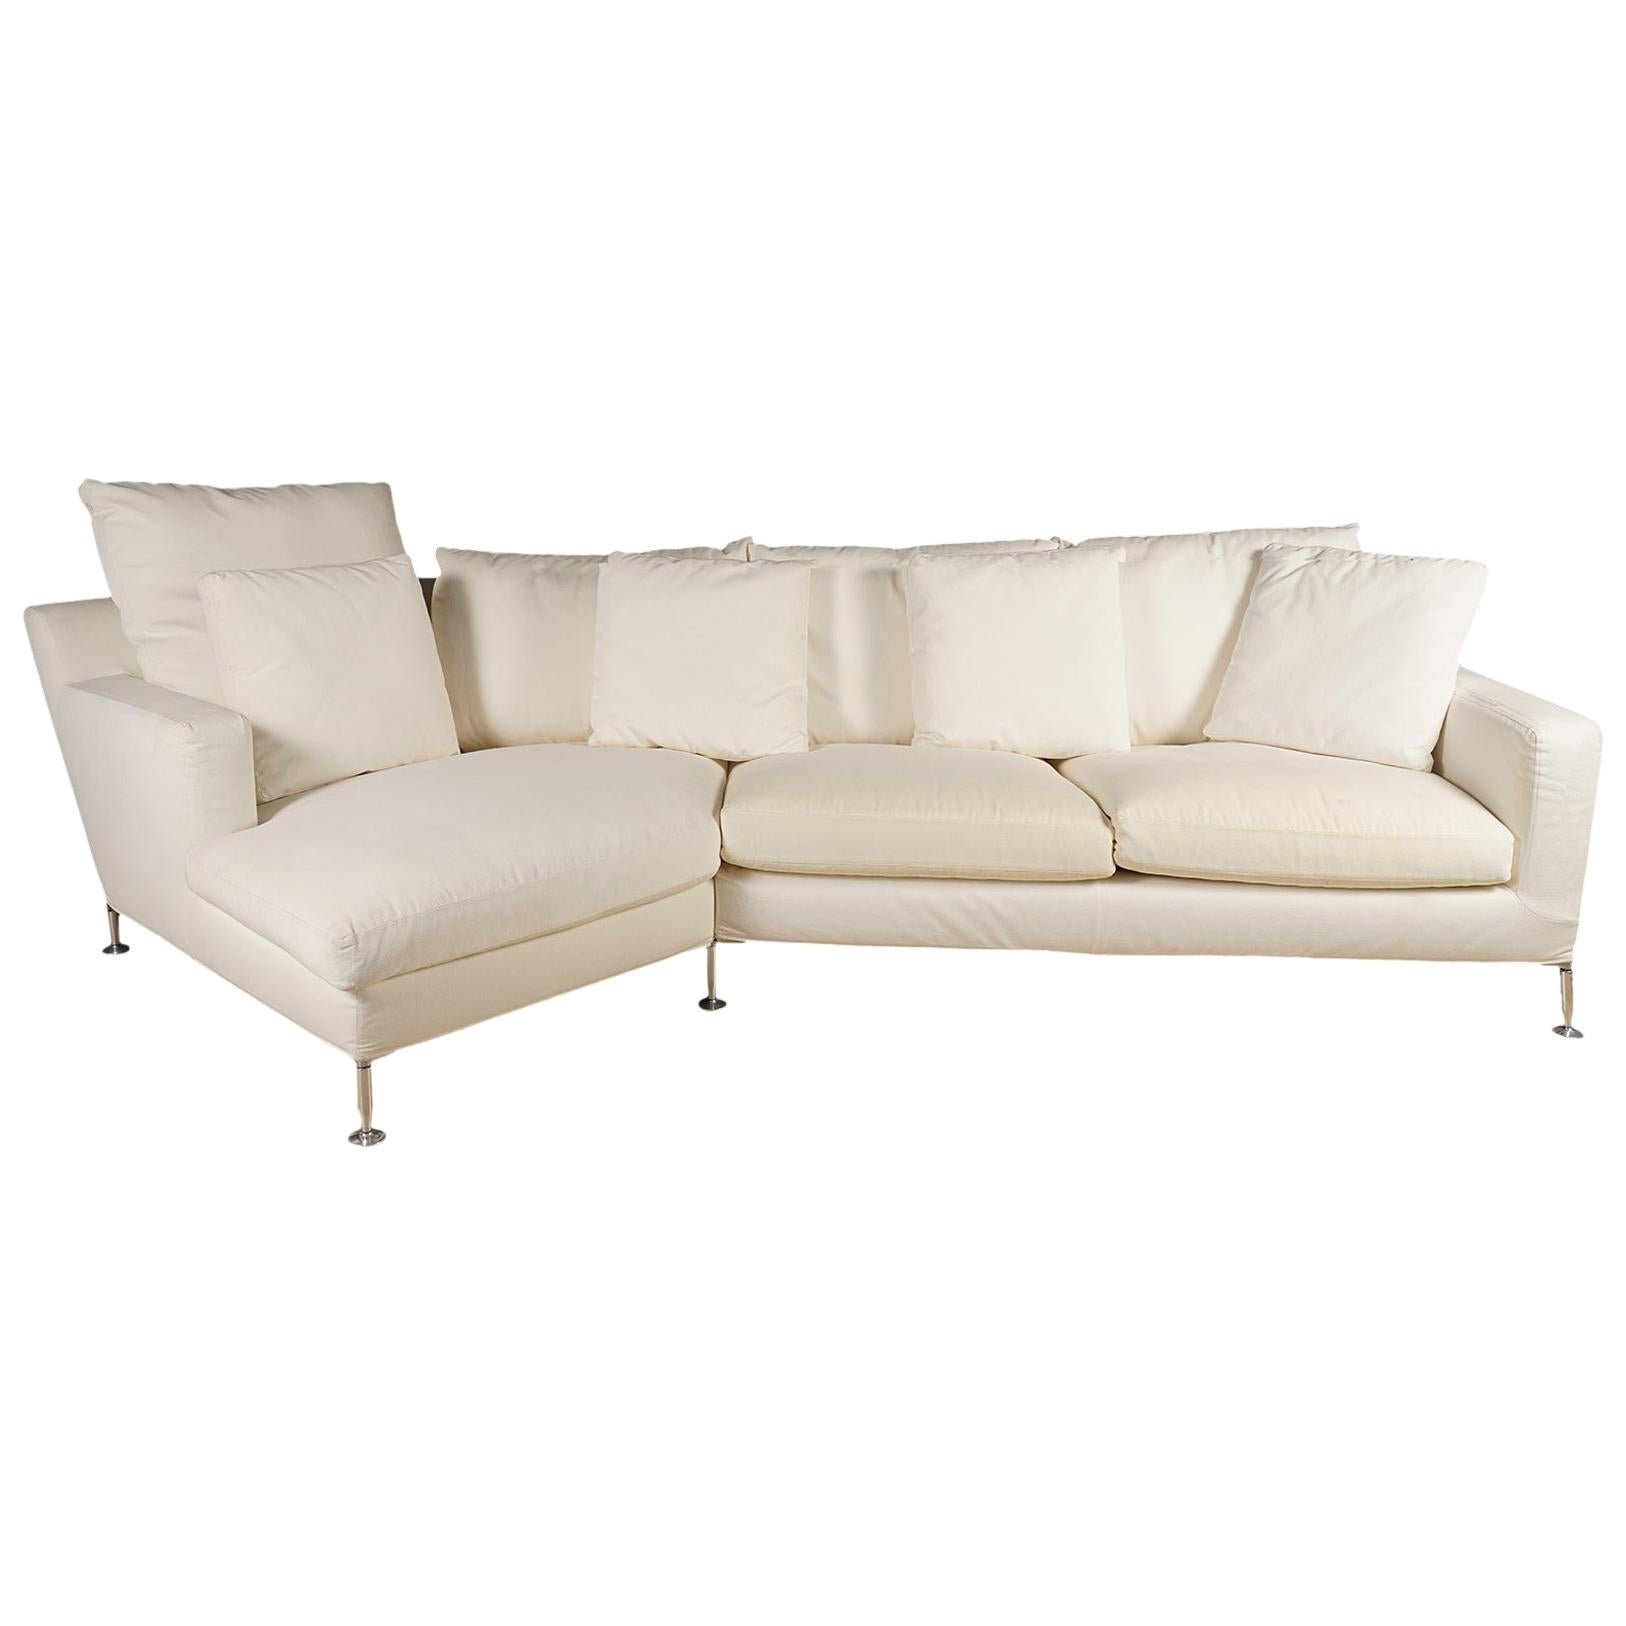 Three-Seat Italian Sofa and Chaise 'Harry' by Antonio Citterio for B&B Italia